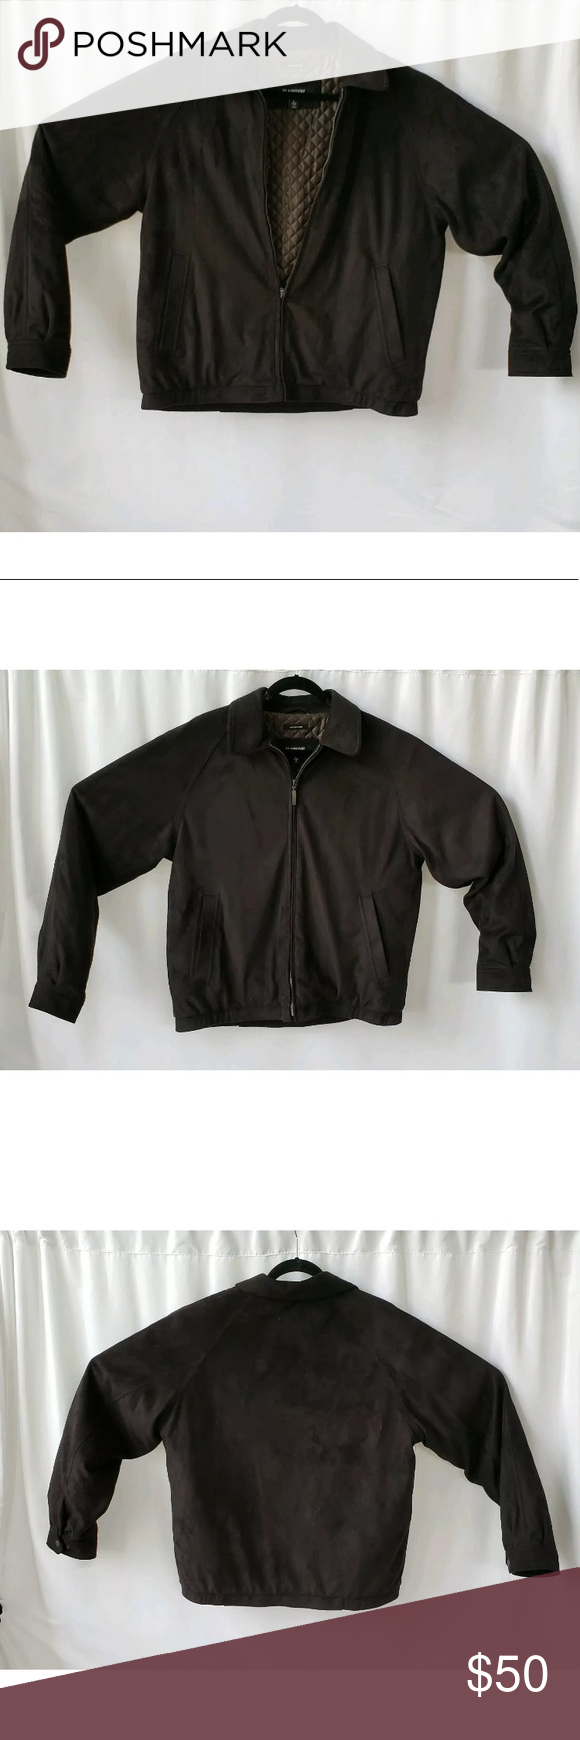 Claiborne Outerwear Microsuede Quilted Line Jacket Line Jackets Clothes Design Claiborne [ 1740 x 580 Pixel ]